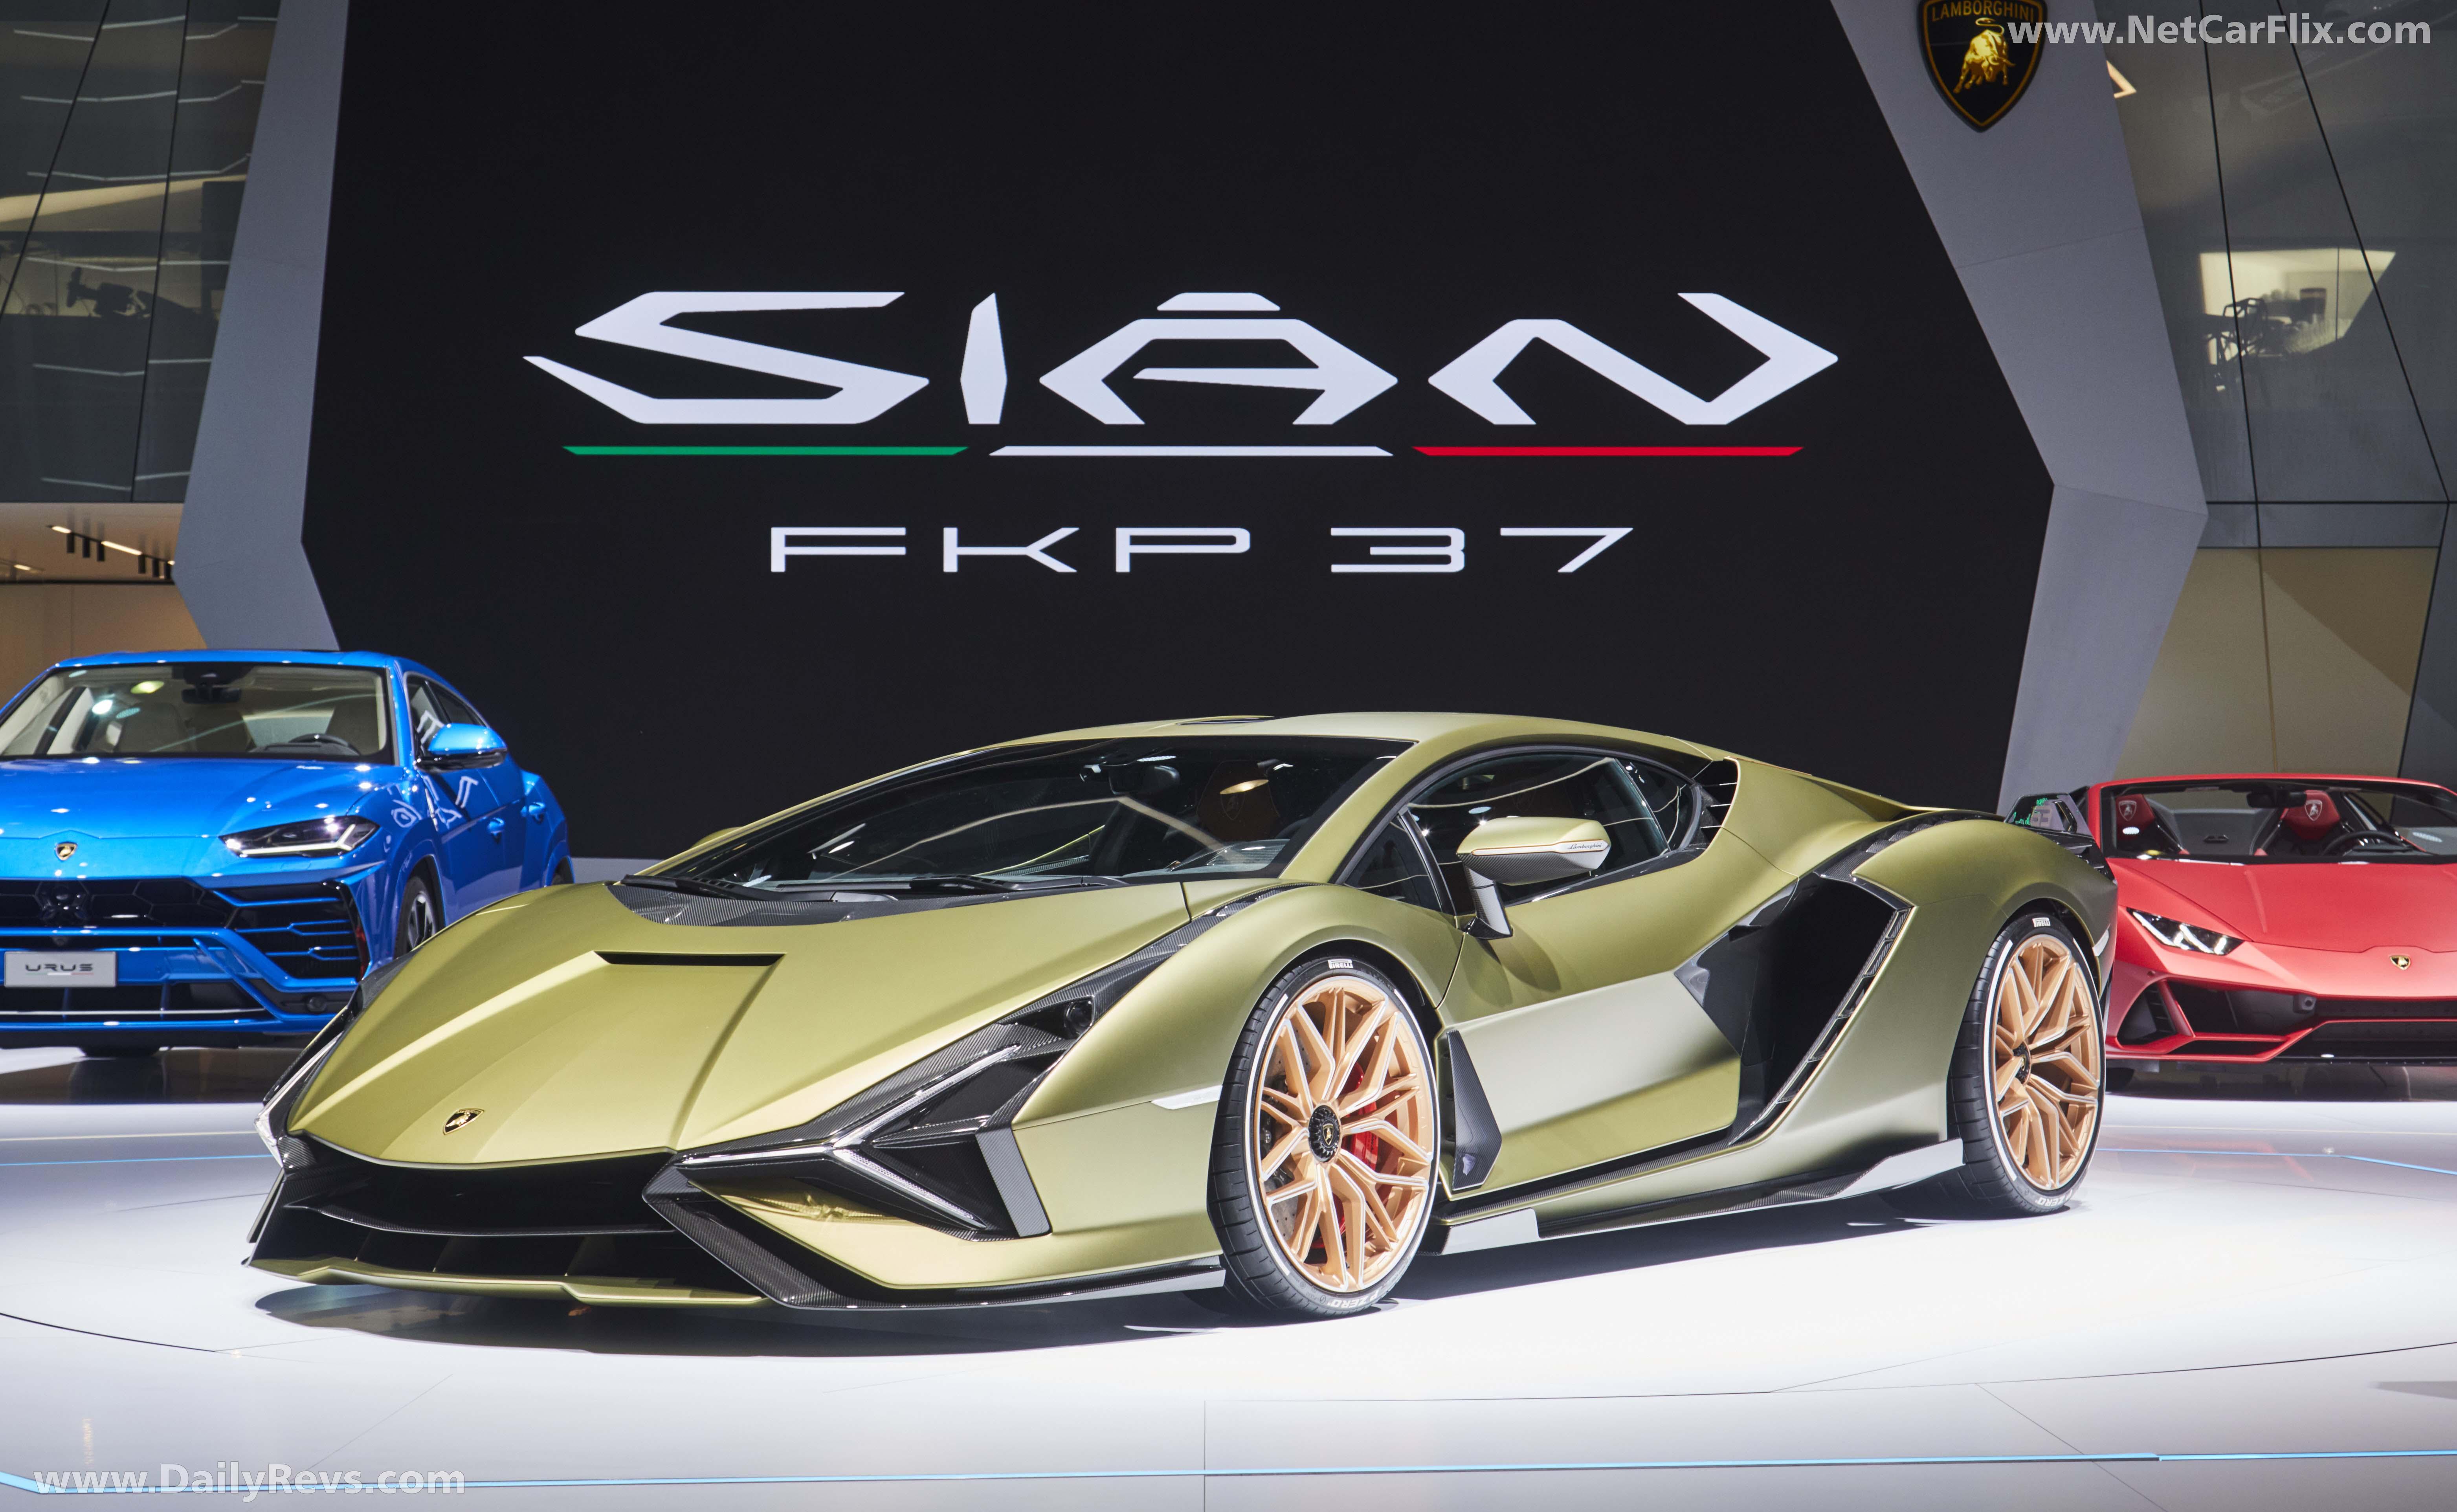 2020 Lamborghini Sian Hq Pictures Specs Information And